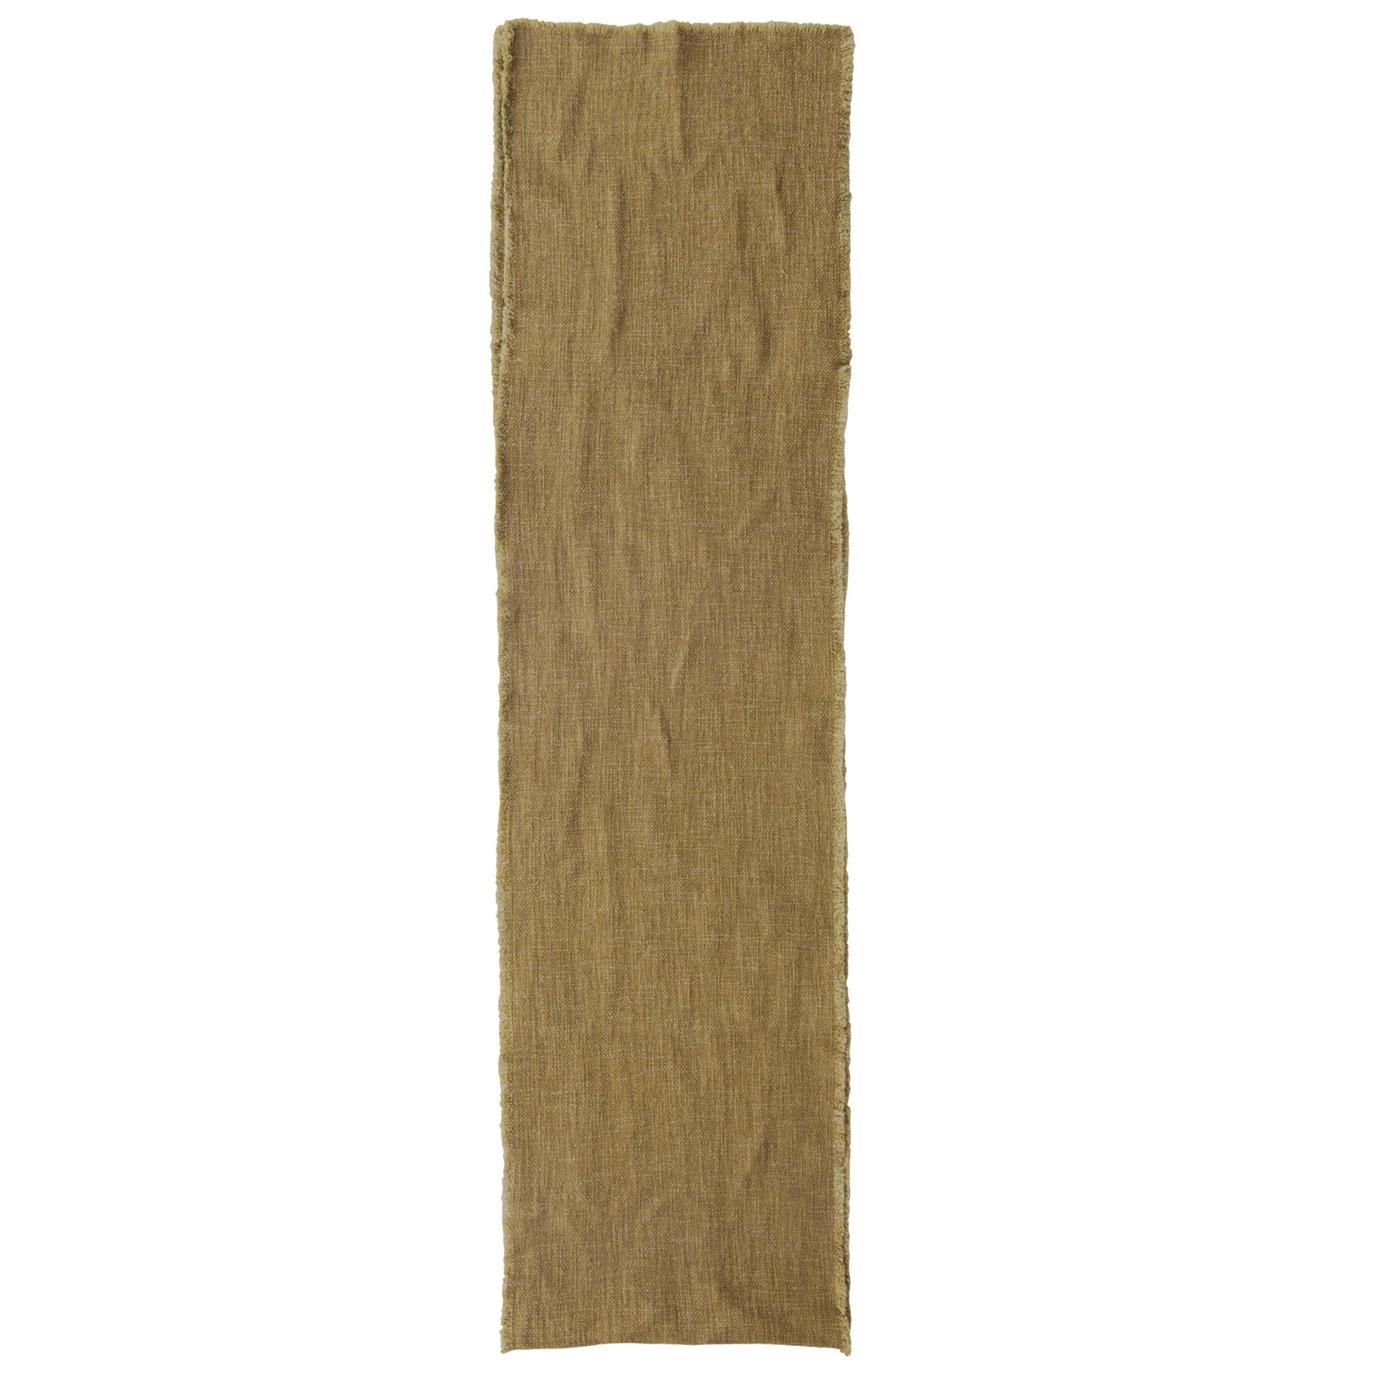 Linen Blend Table Runner with Frayed Edges, Olive Color